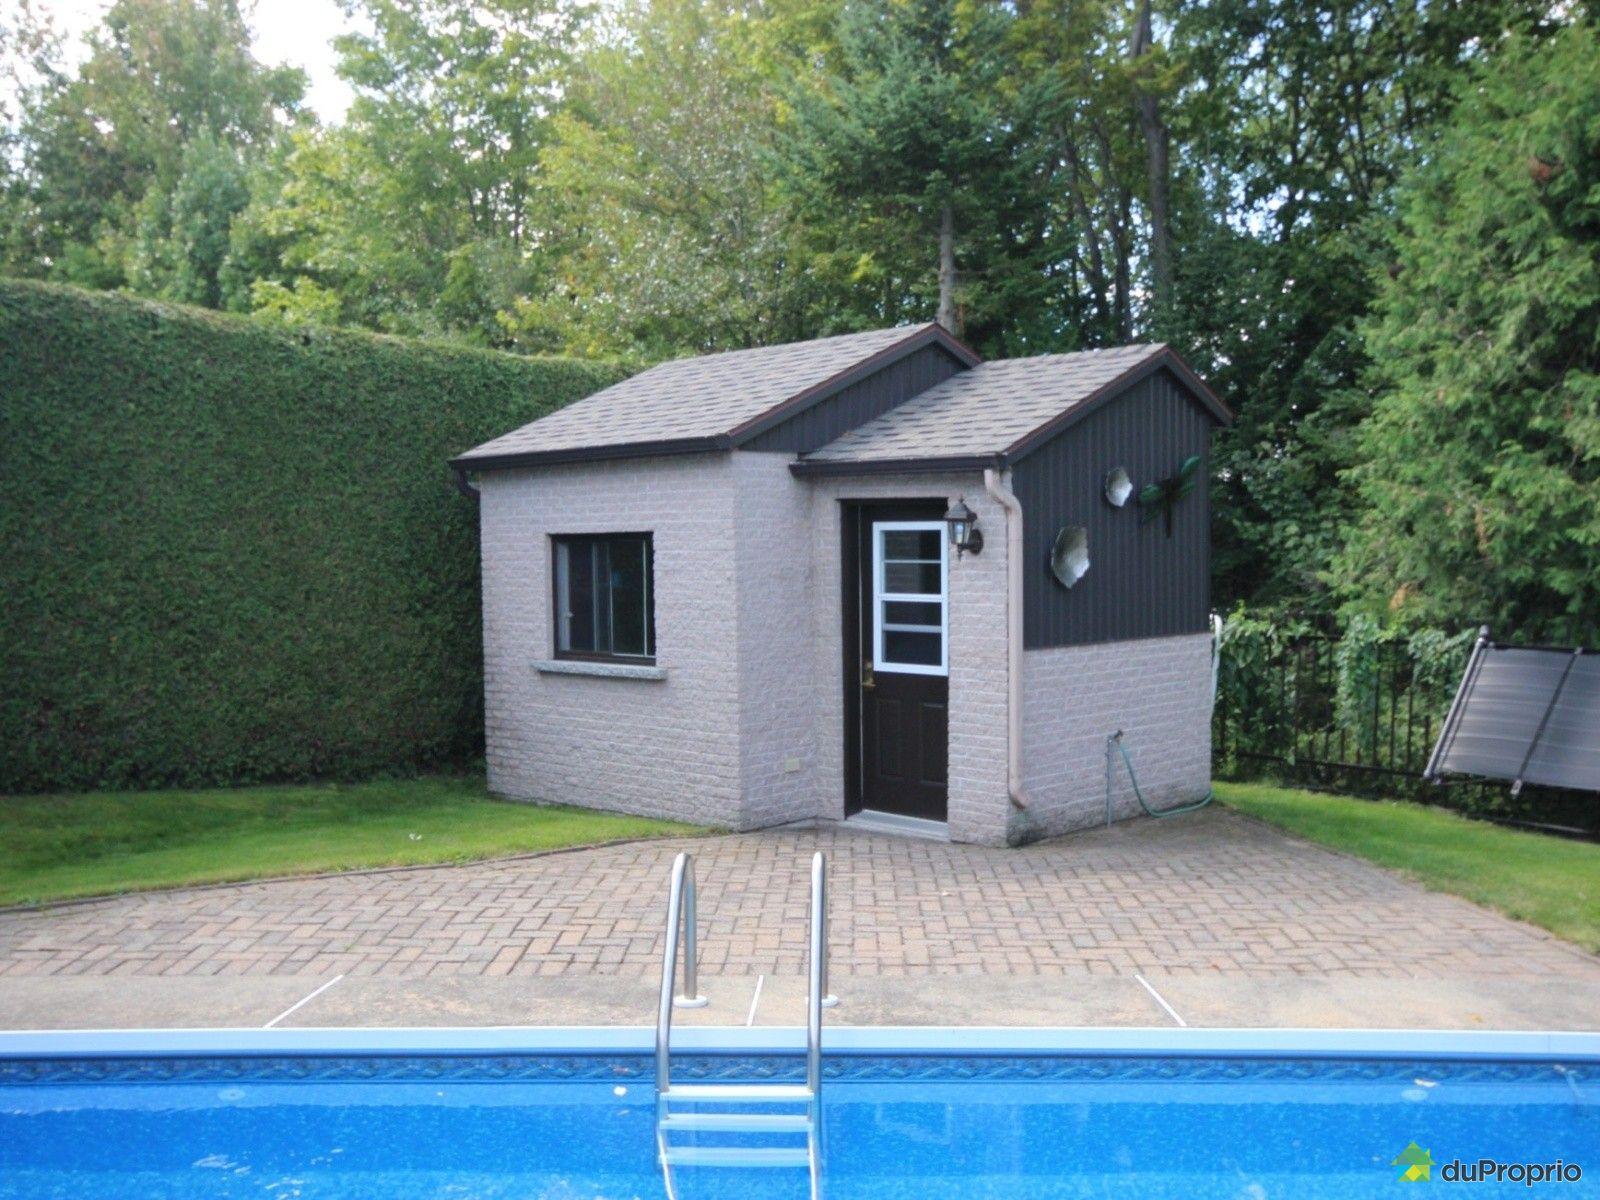 Maison vendu victoriaville immobilier qu bec duproprio for Chauffage piscine quebec